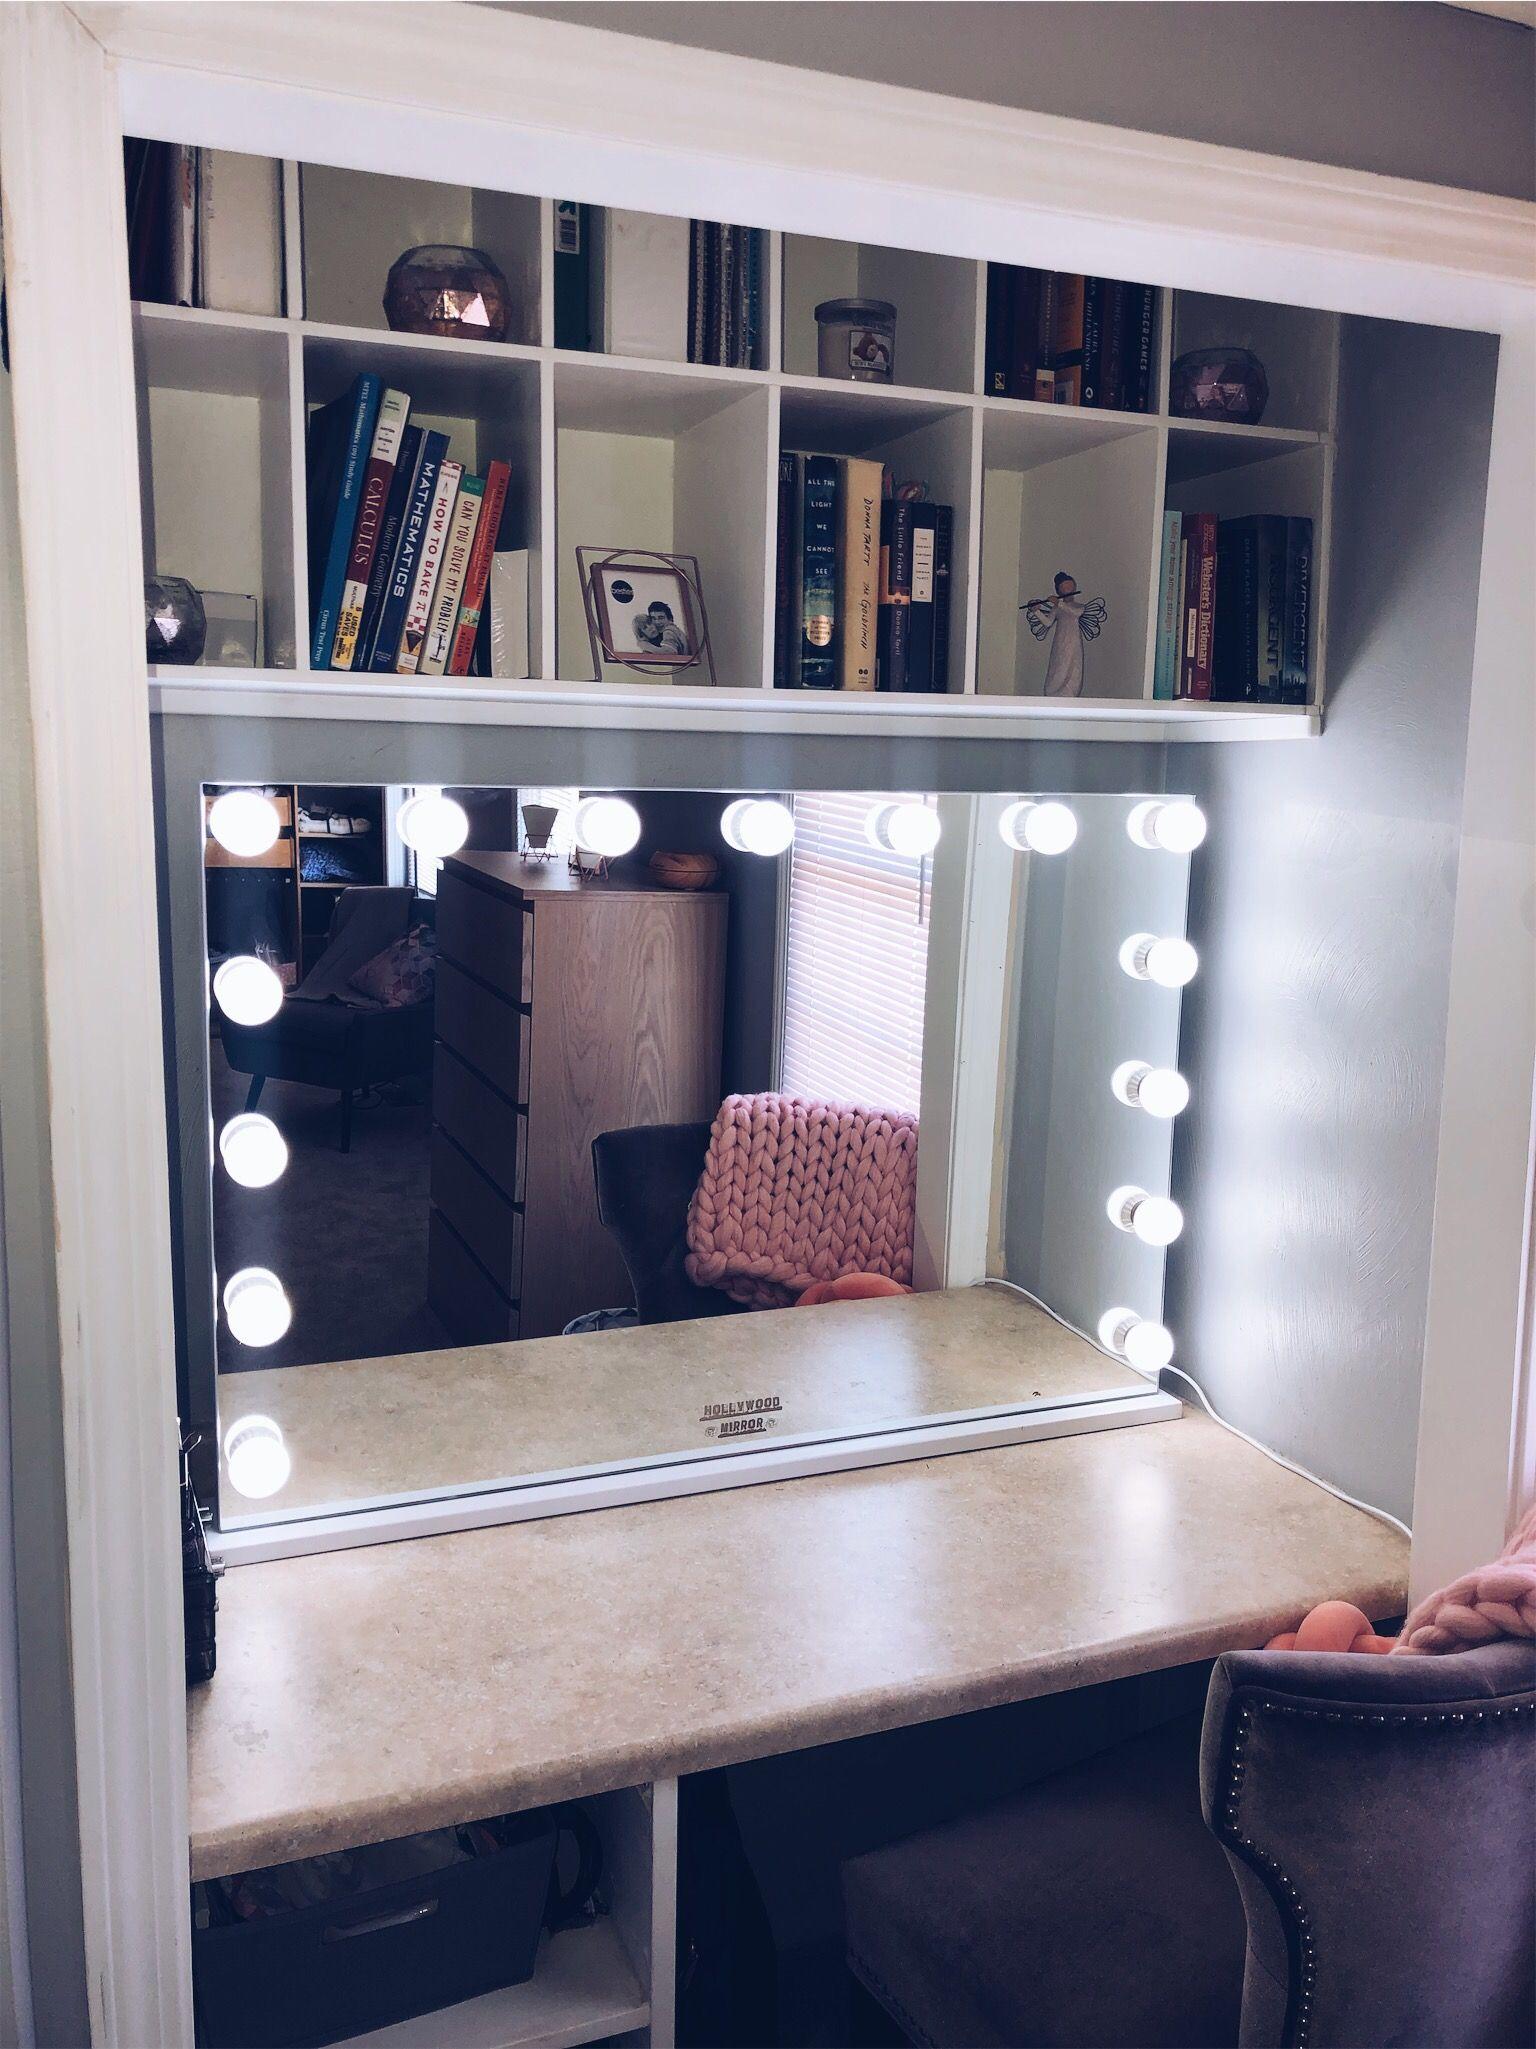 Vanity mirror with lights, wall plugin, Hollywood mirror